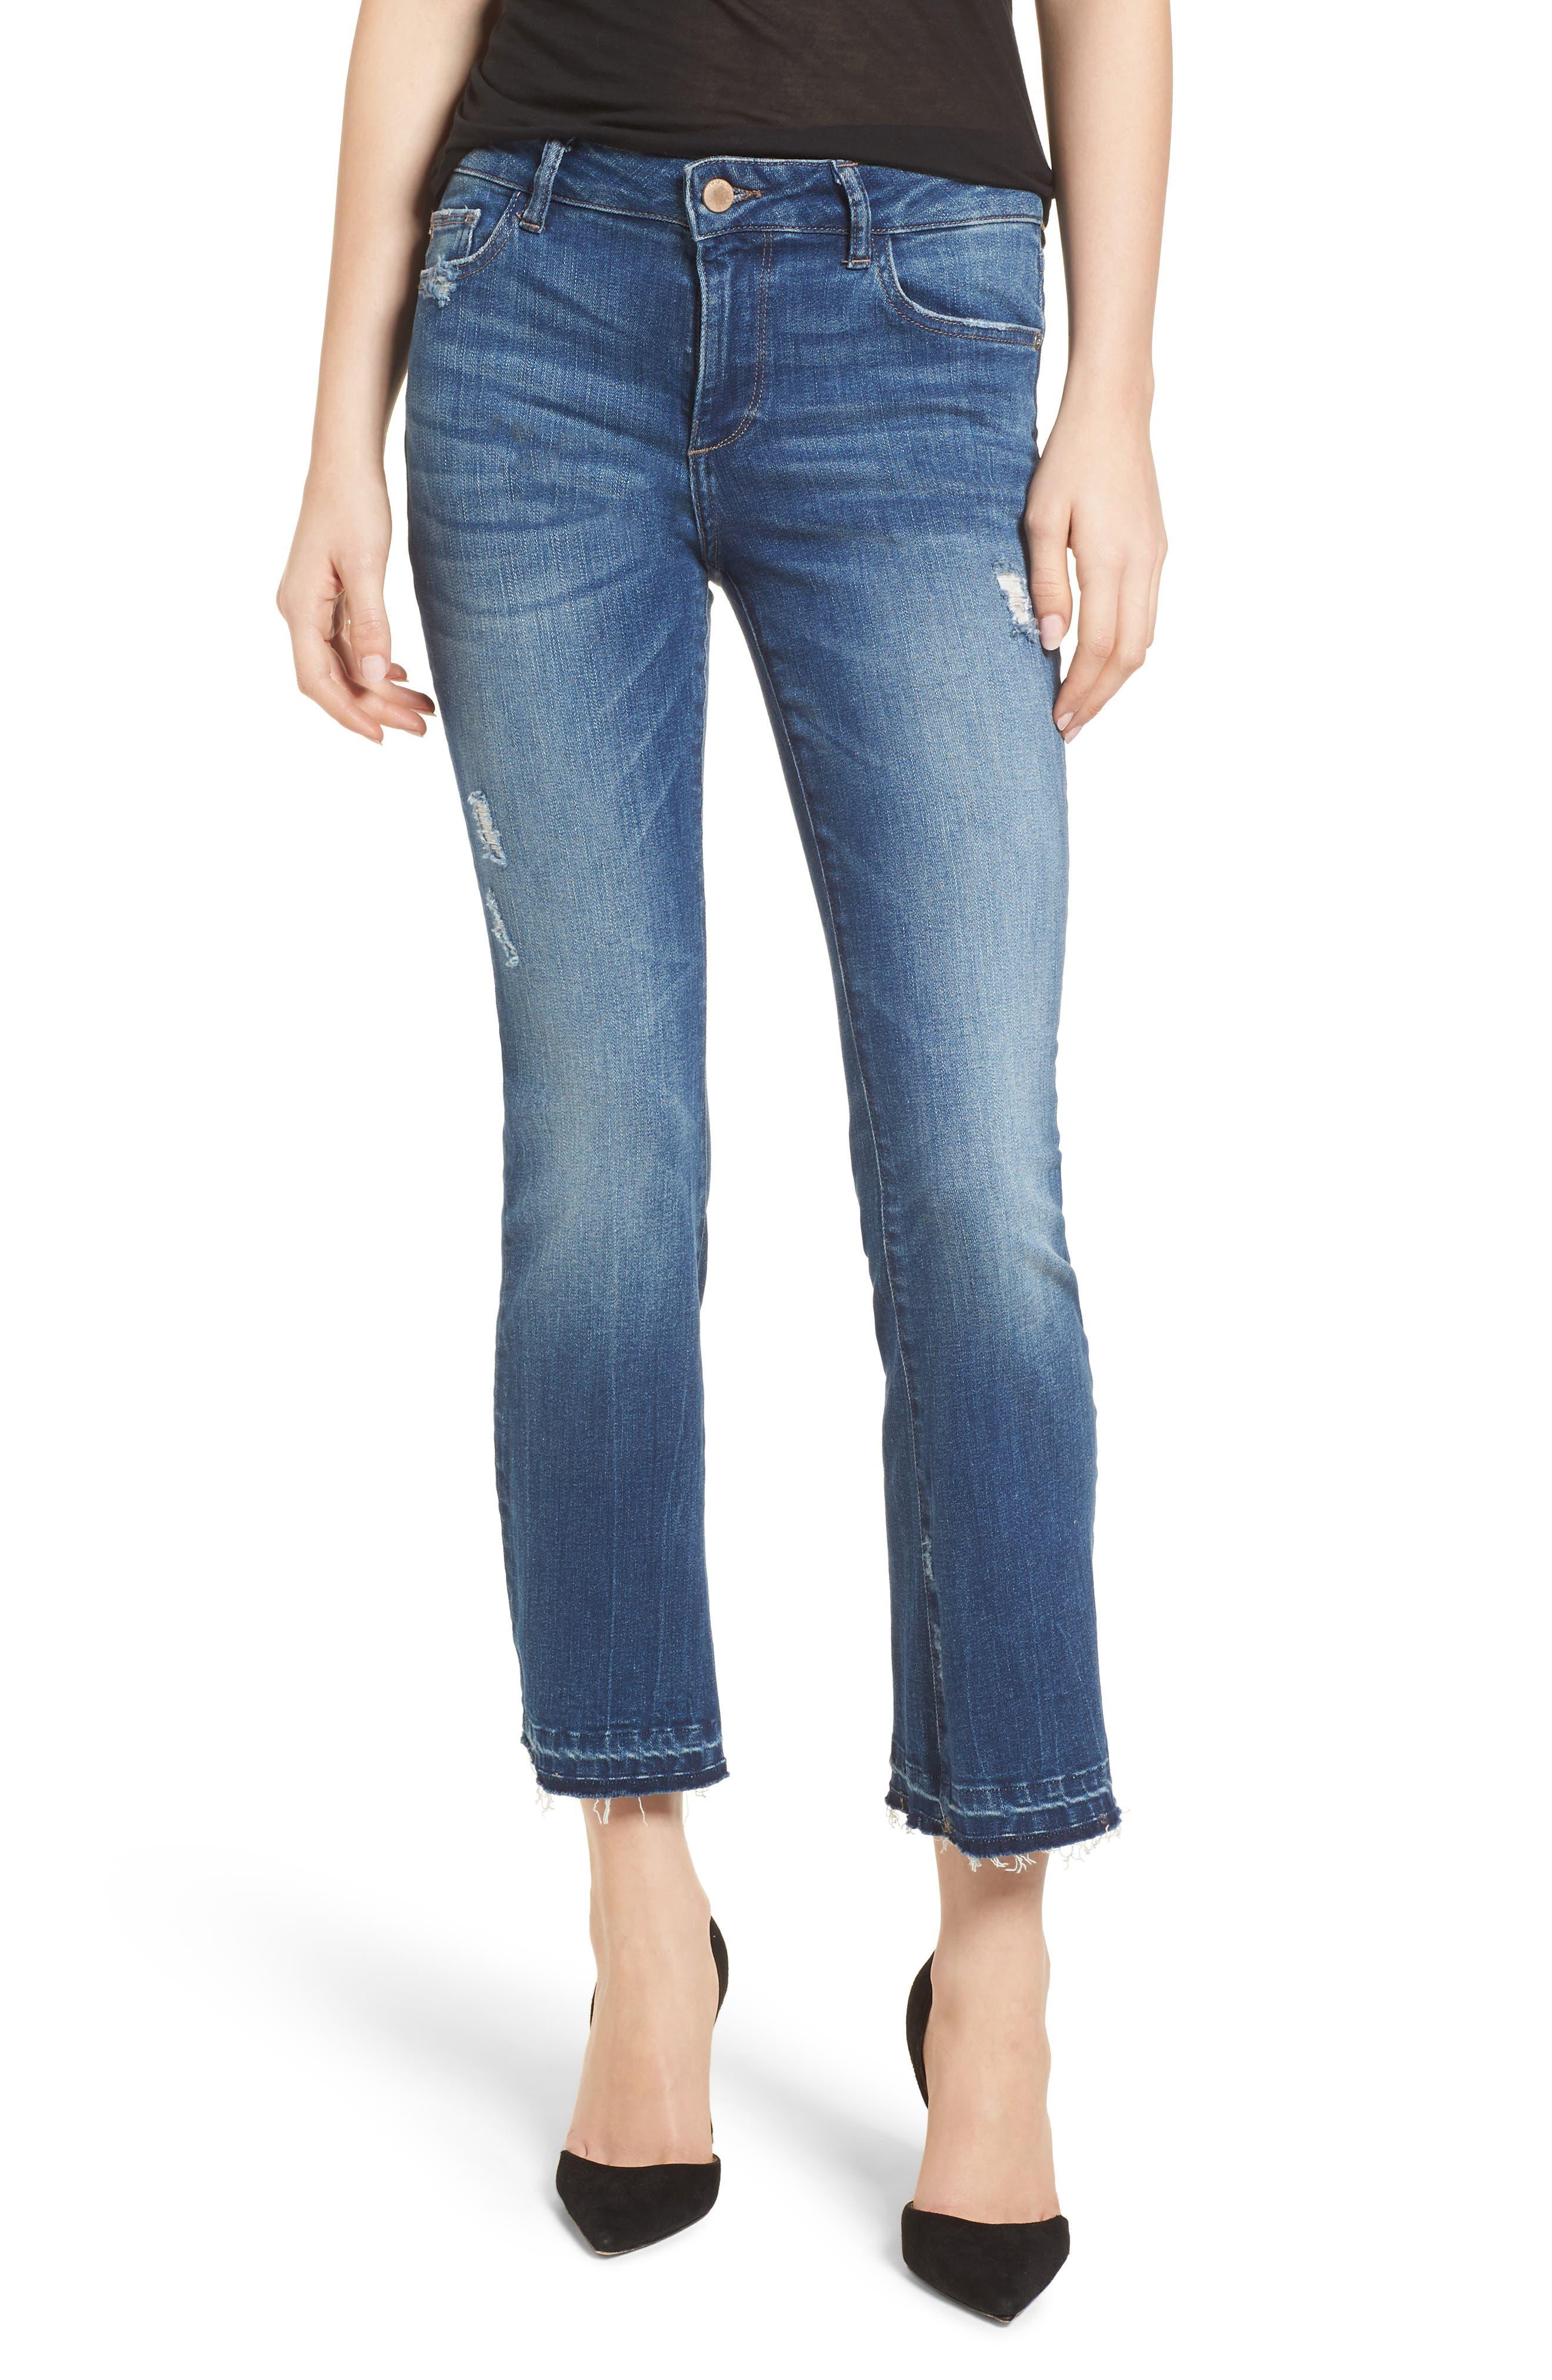 Dl 1961 Lara Instasculpt Crop Boot Jeans in Alma